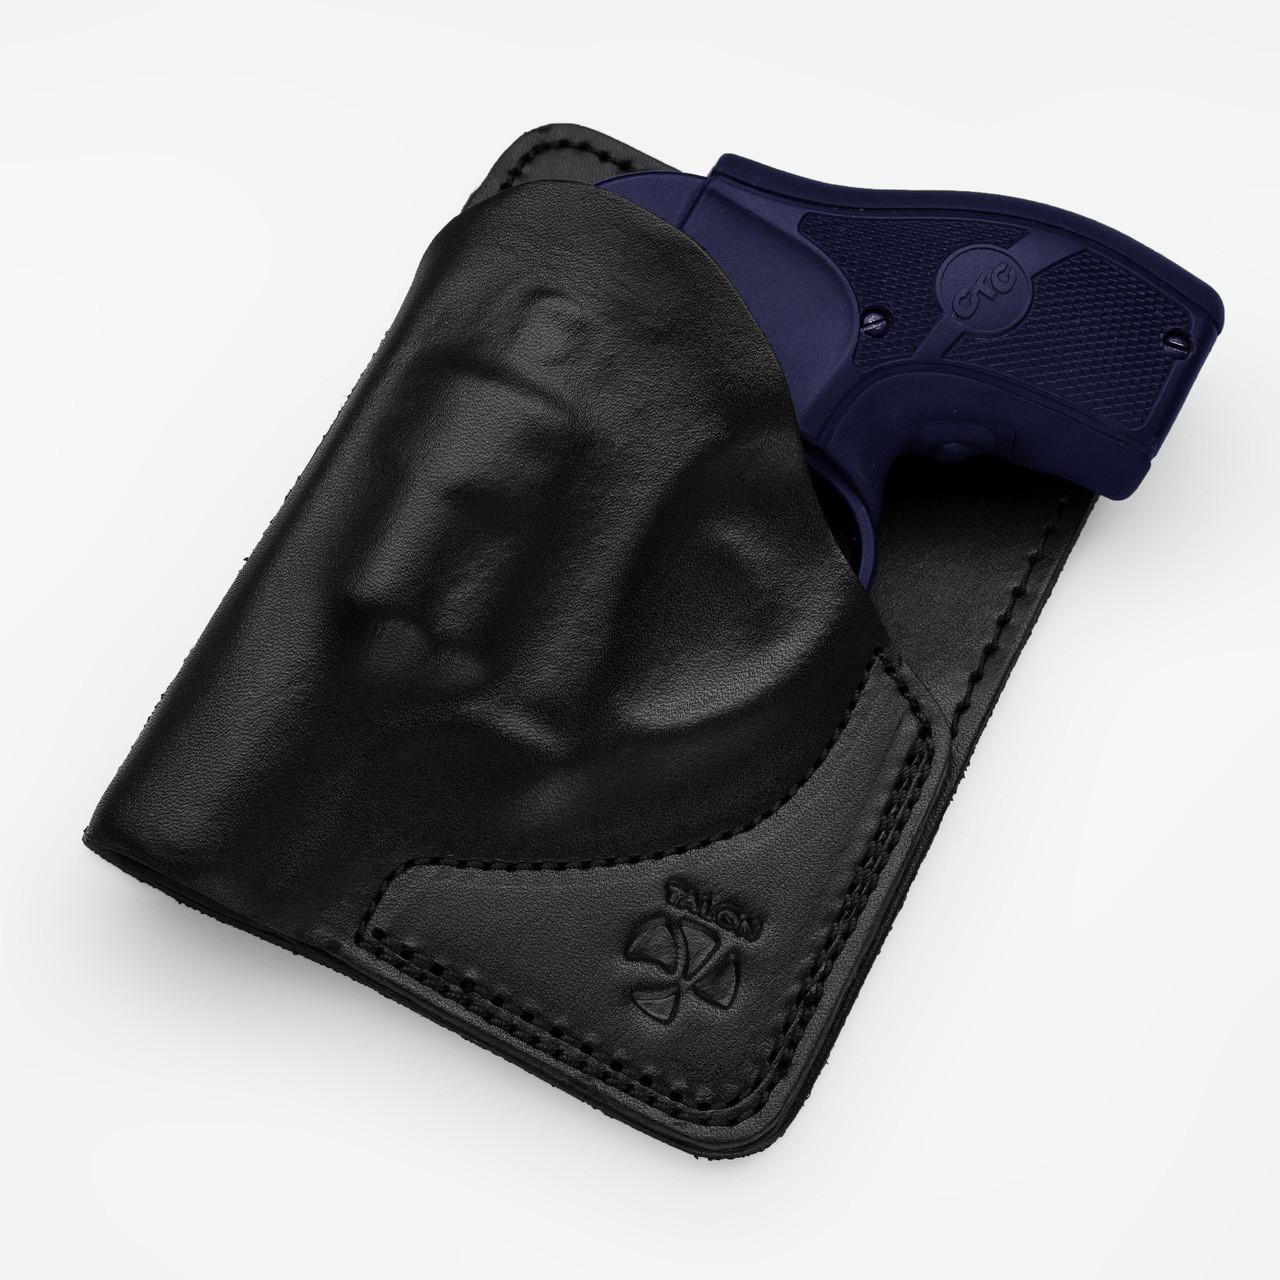 Talon Ruger LCR Cargo Pocket Holster